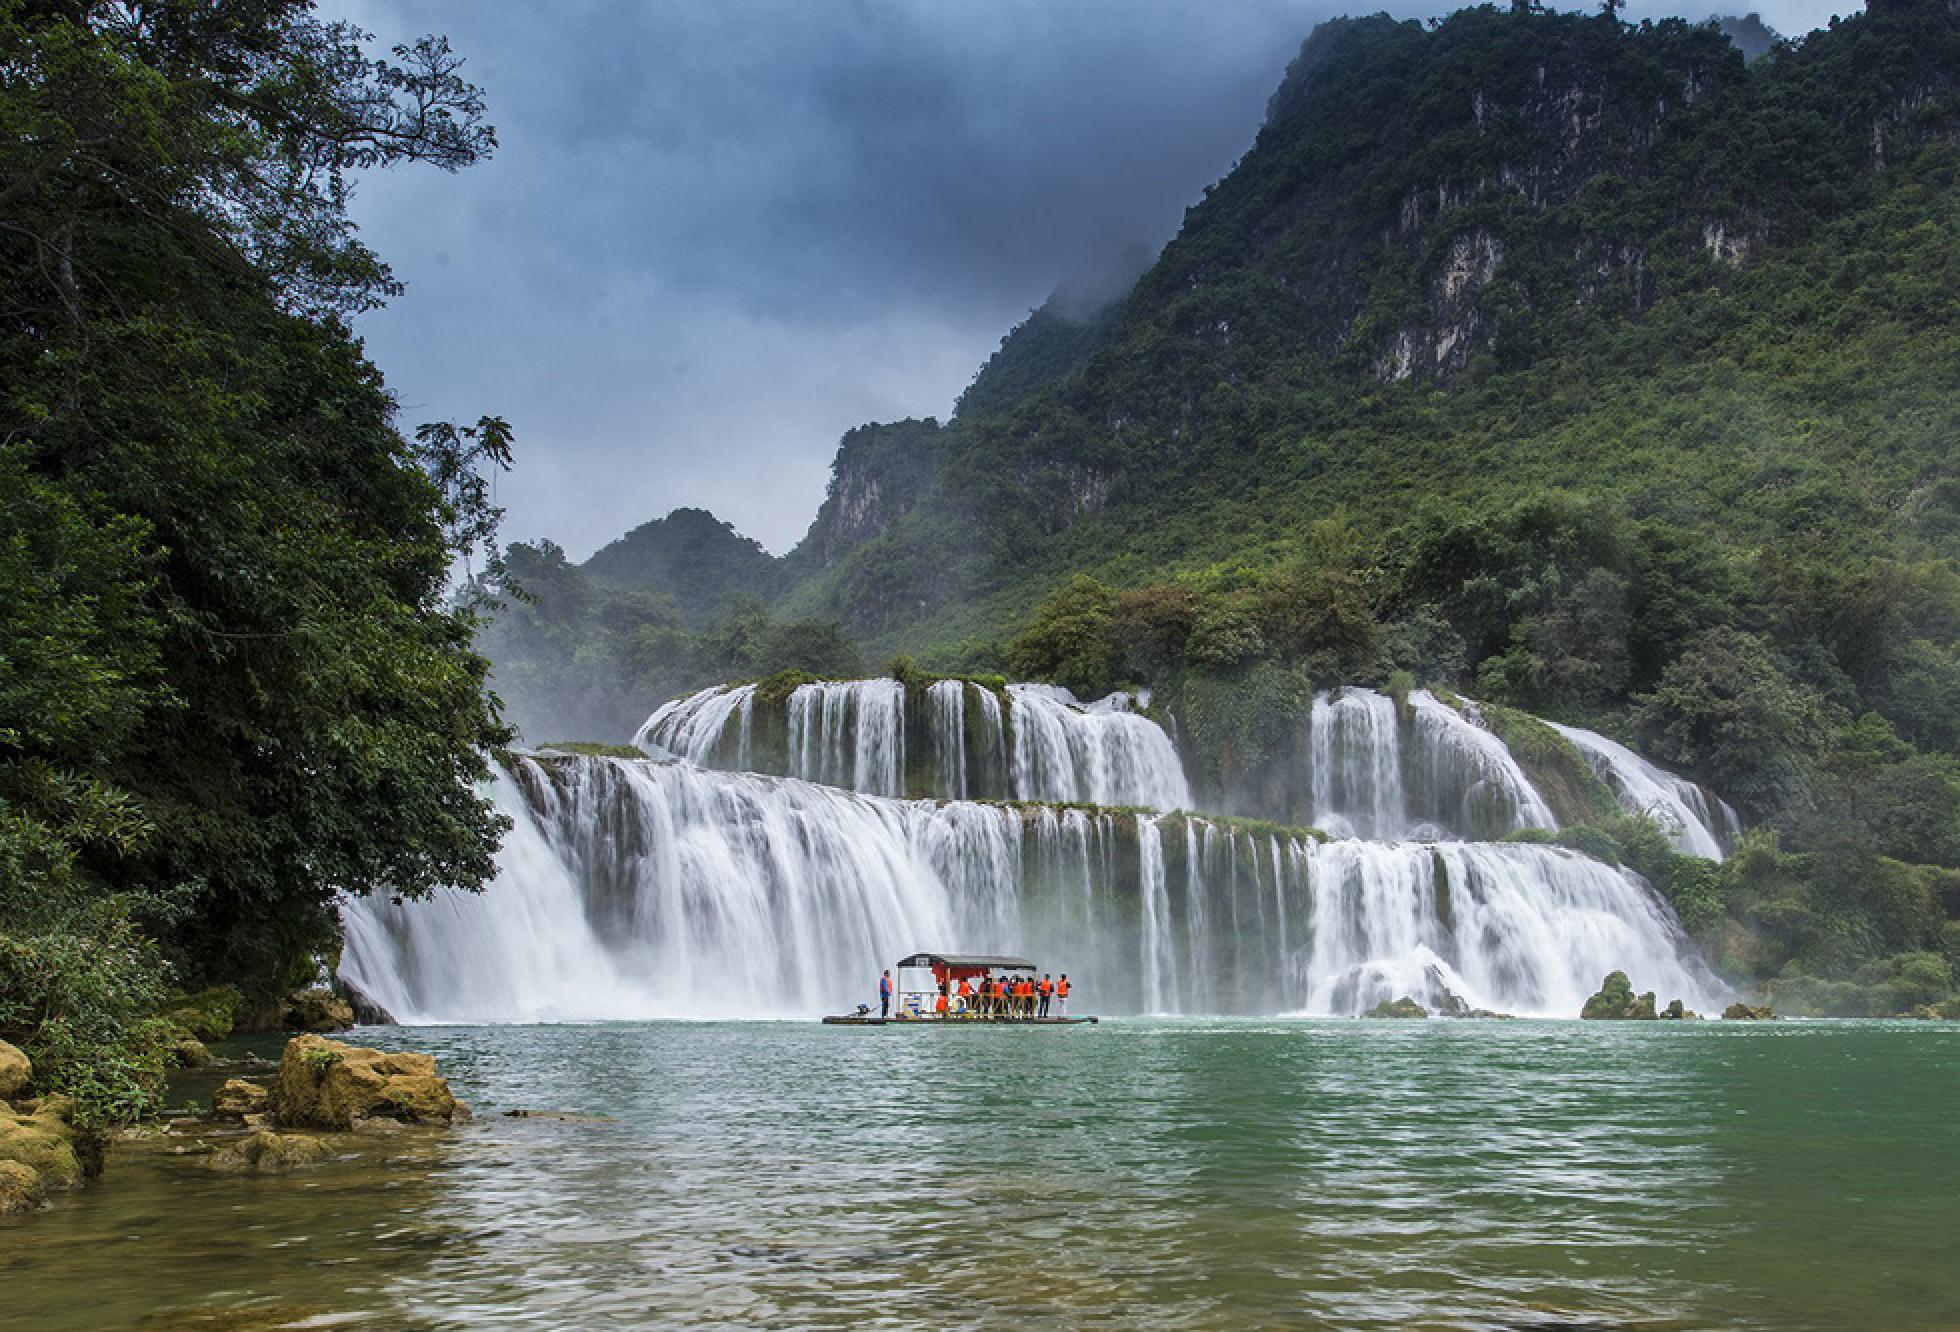 Ban Gioc Waterfall - Babe Lake 3 Days Group Tour from Hanoi